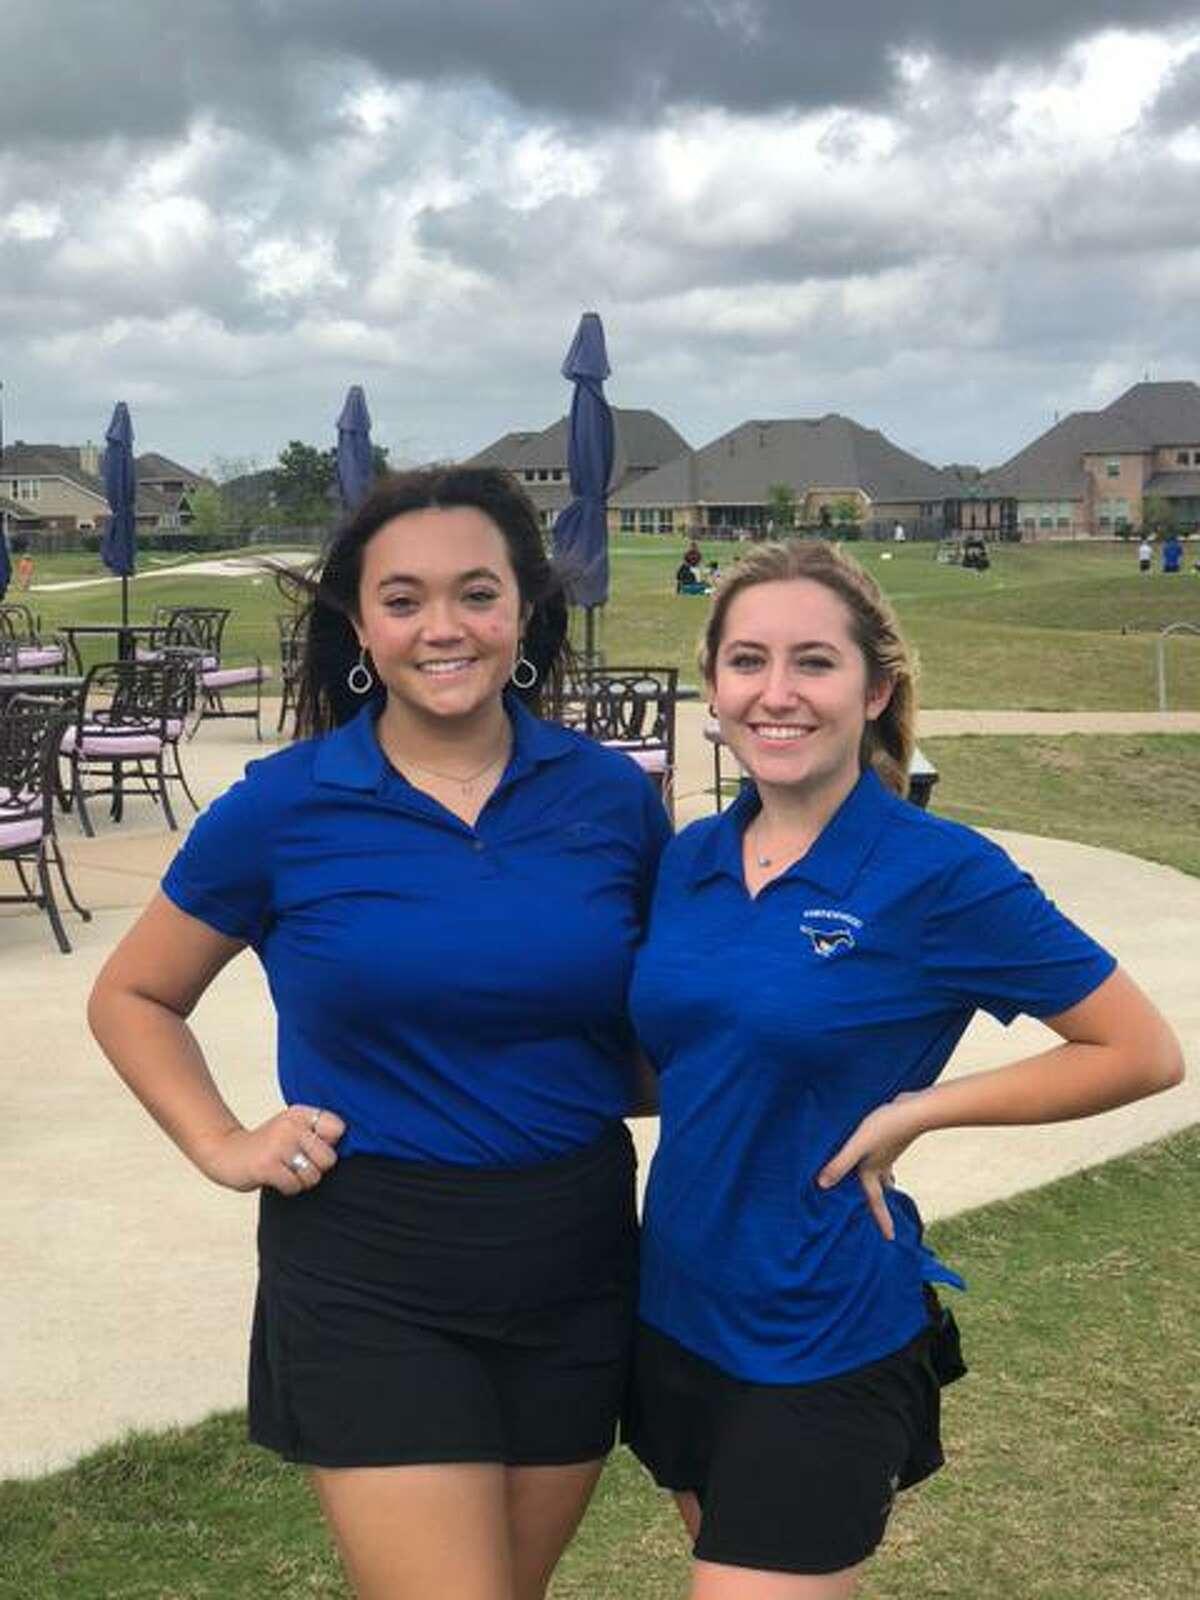 Friendswood's Lauren Epperson (left) and Kamden Estlinbaum will compete as medalists in the Region III-5A golf tournament next week in College Station